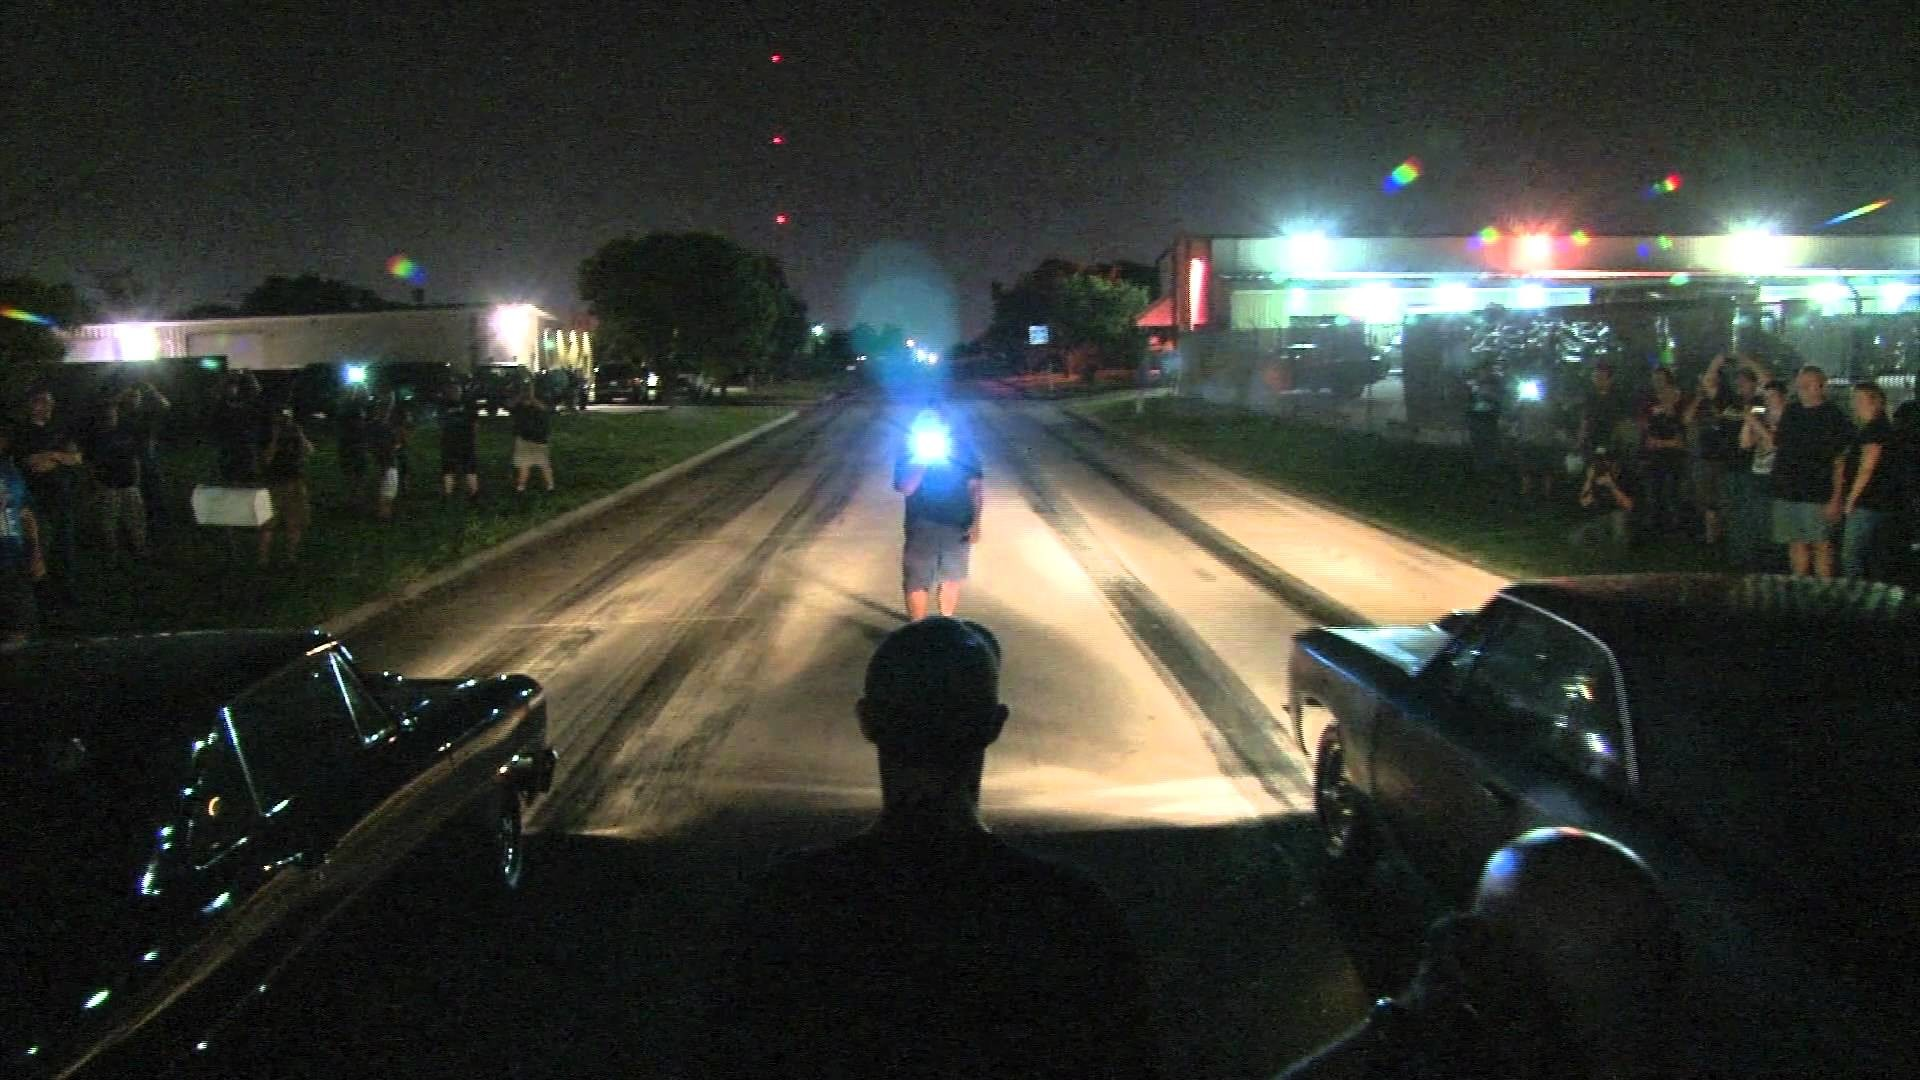 Res: 1920x1080, 1000HP+ STREET RACING - Cash Days VII DVD Trailer - YouTube